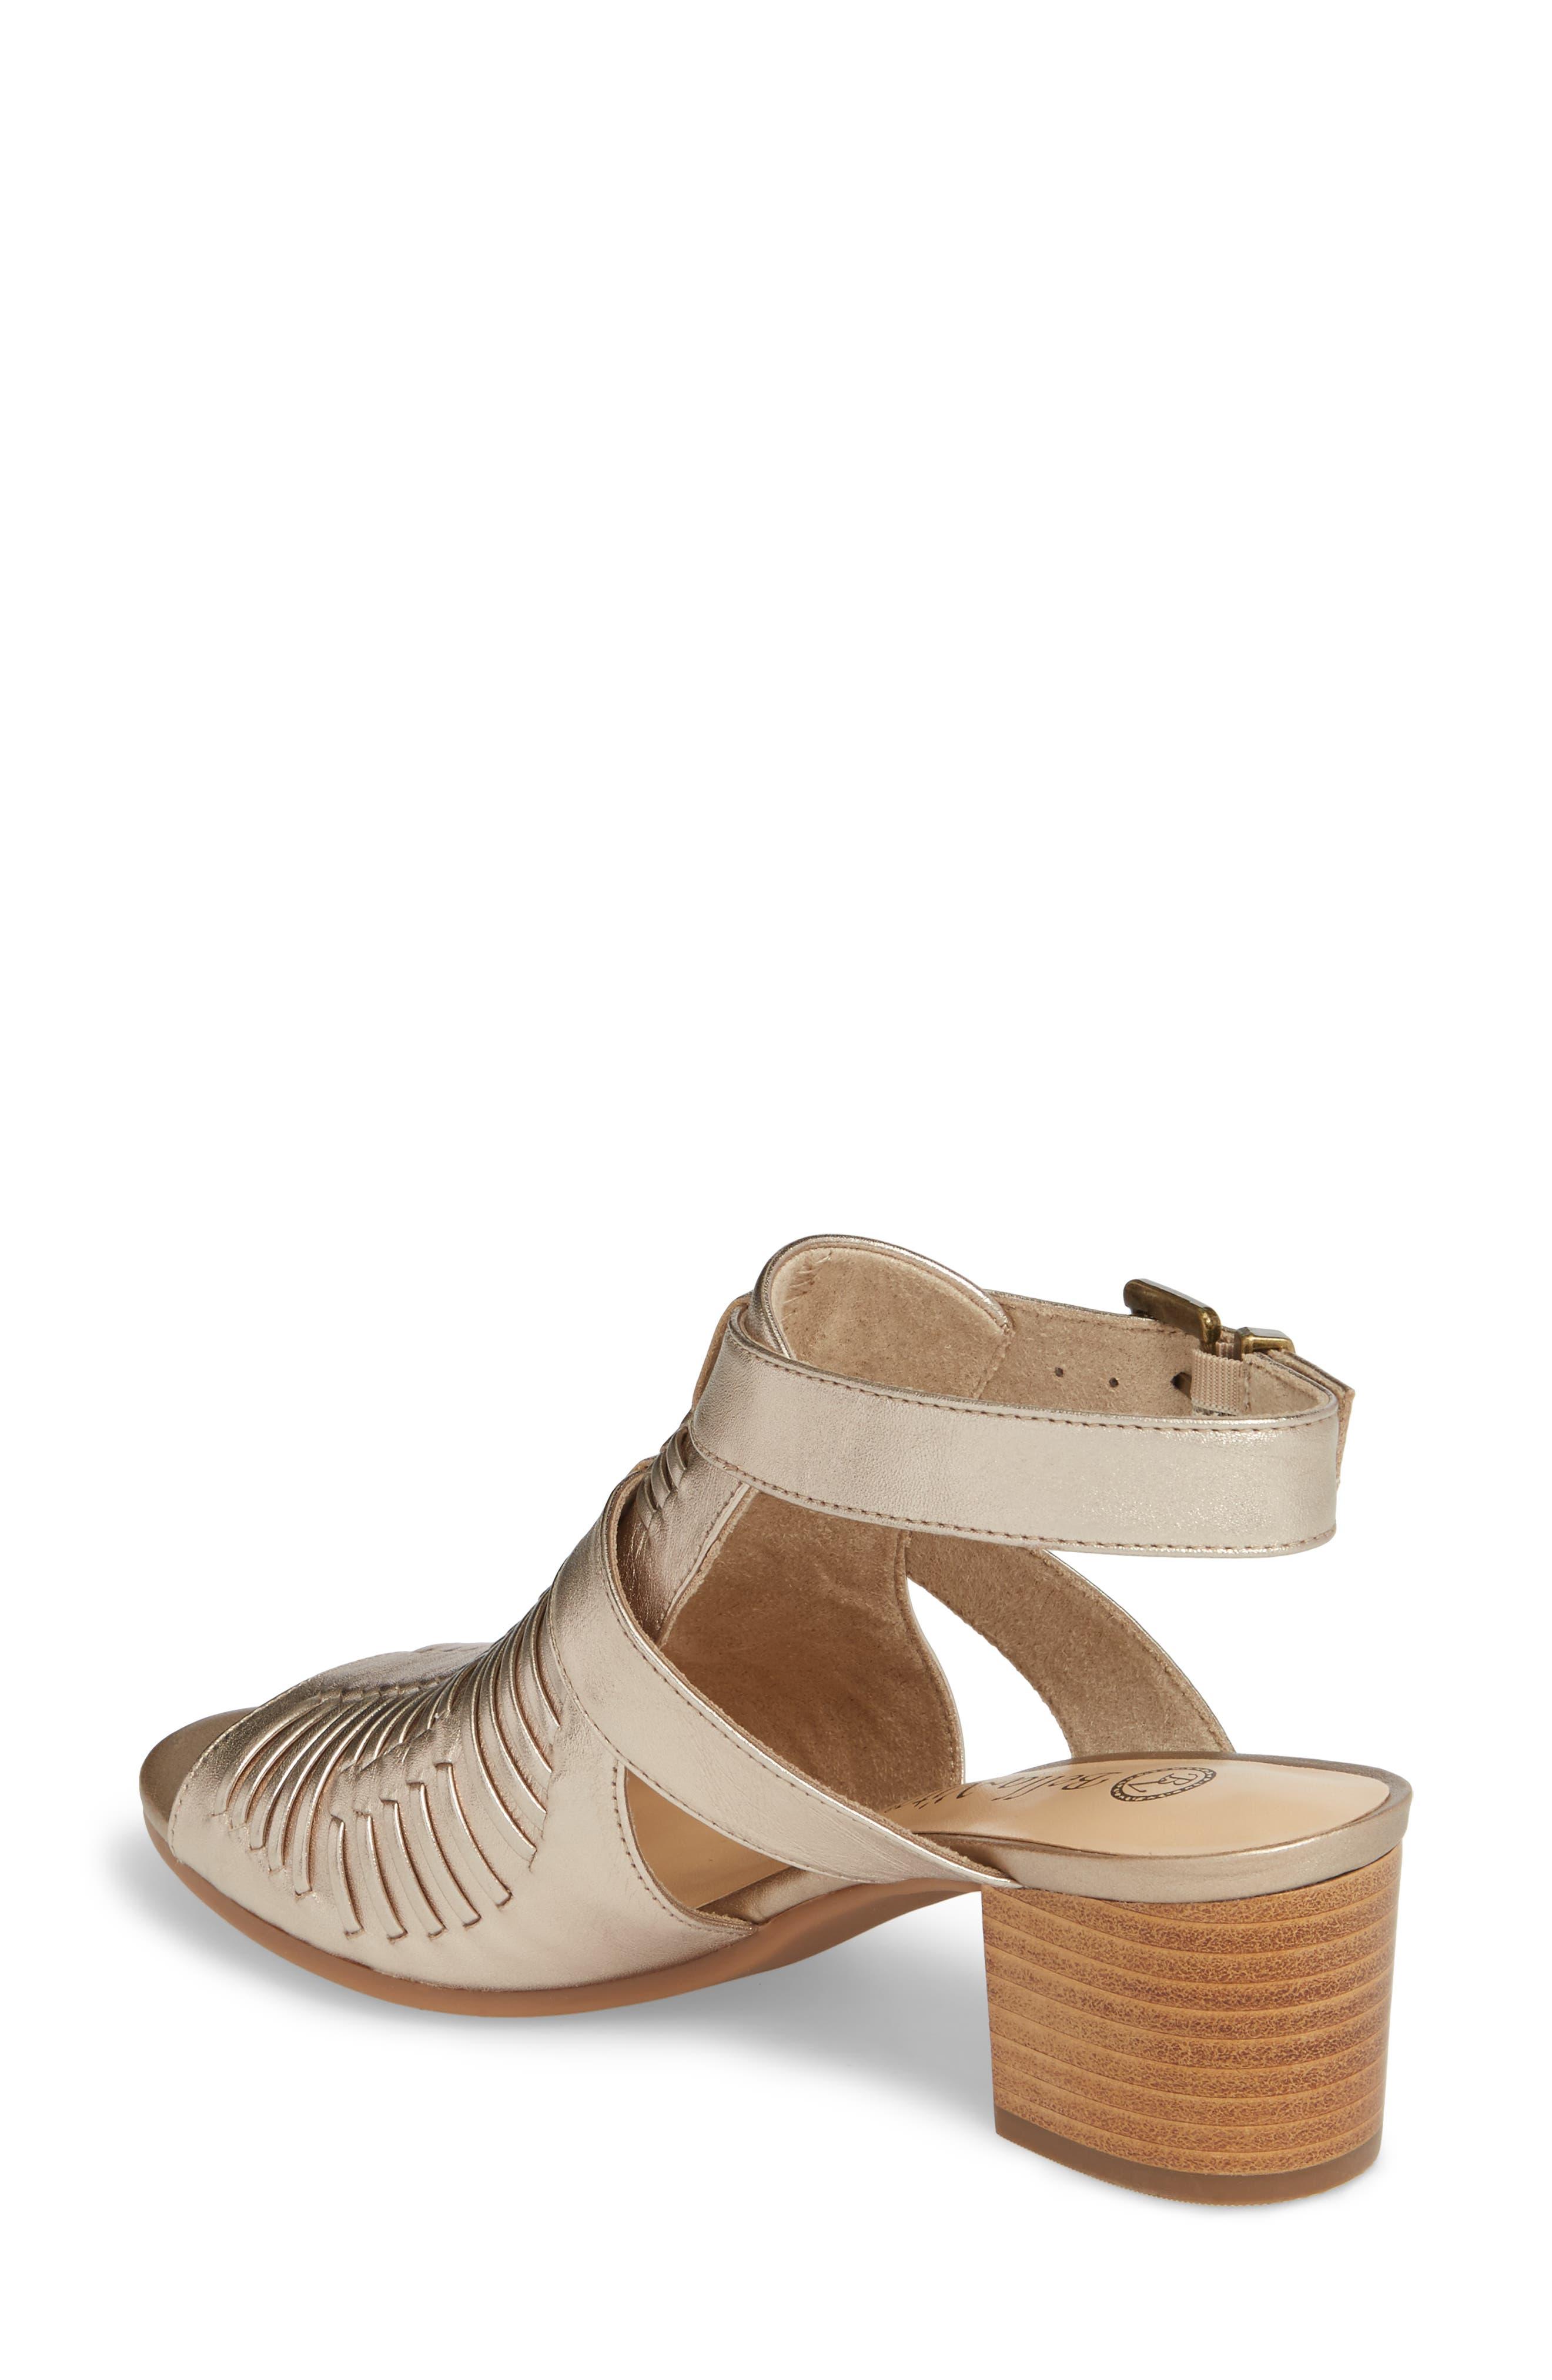 Finley Ankle Strap Sandal,                             Alternate thumbnail 8, color,